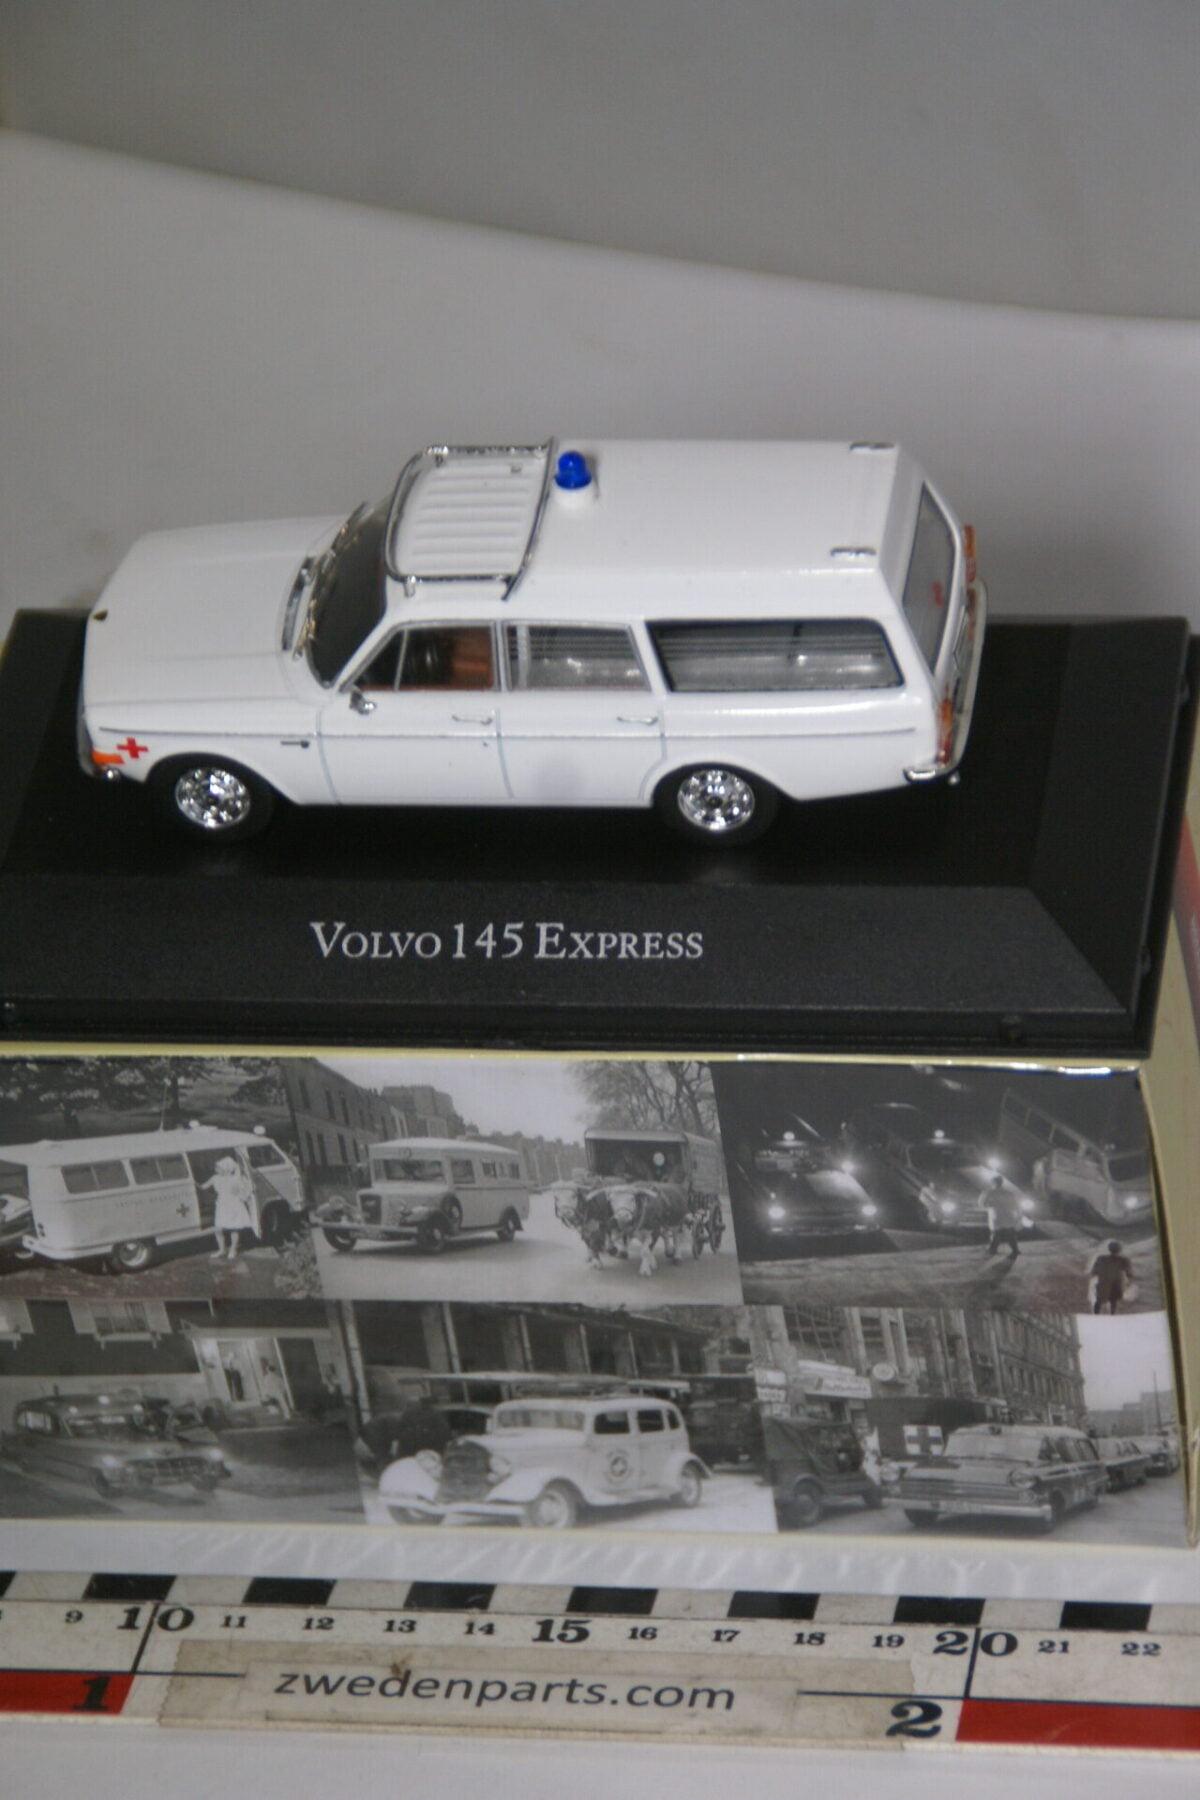 DSC04690 miniatuur 1970 Volvo 145 Express ambulance 1op43 Atlas nr 7495007 MB-ae9748b8